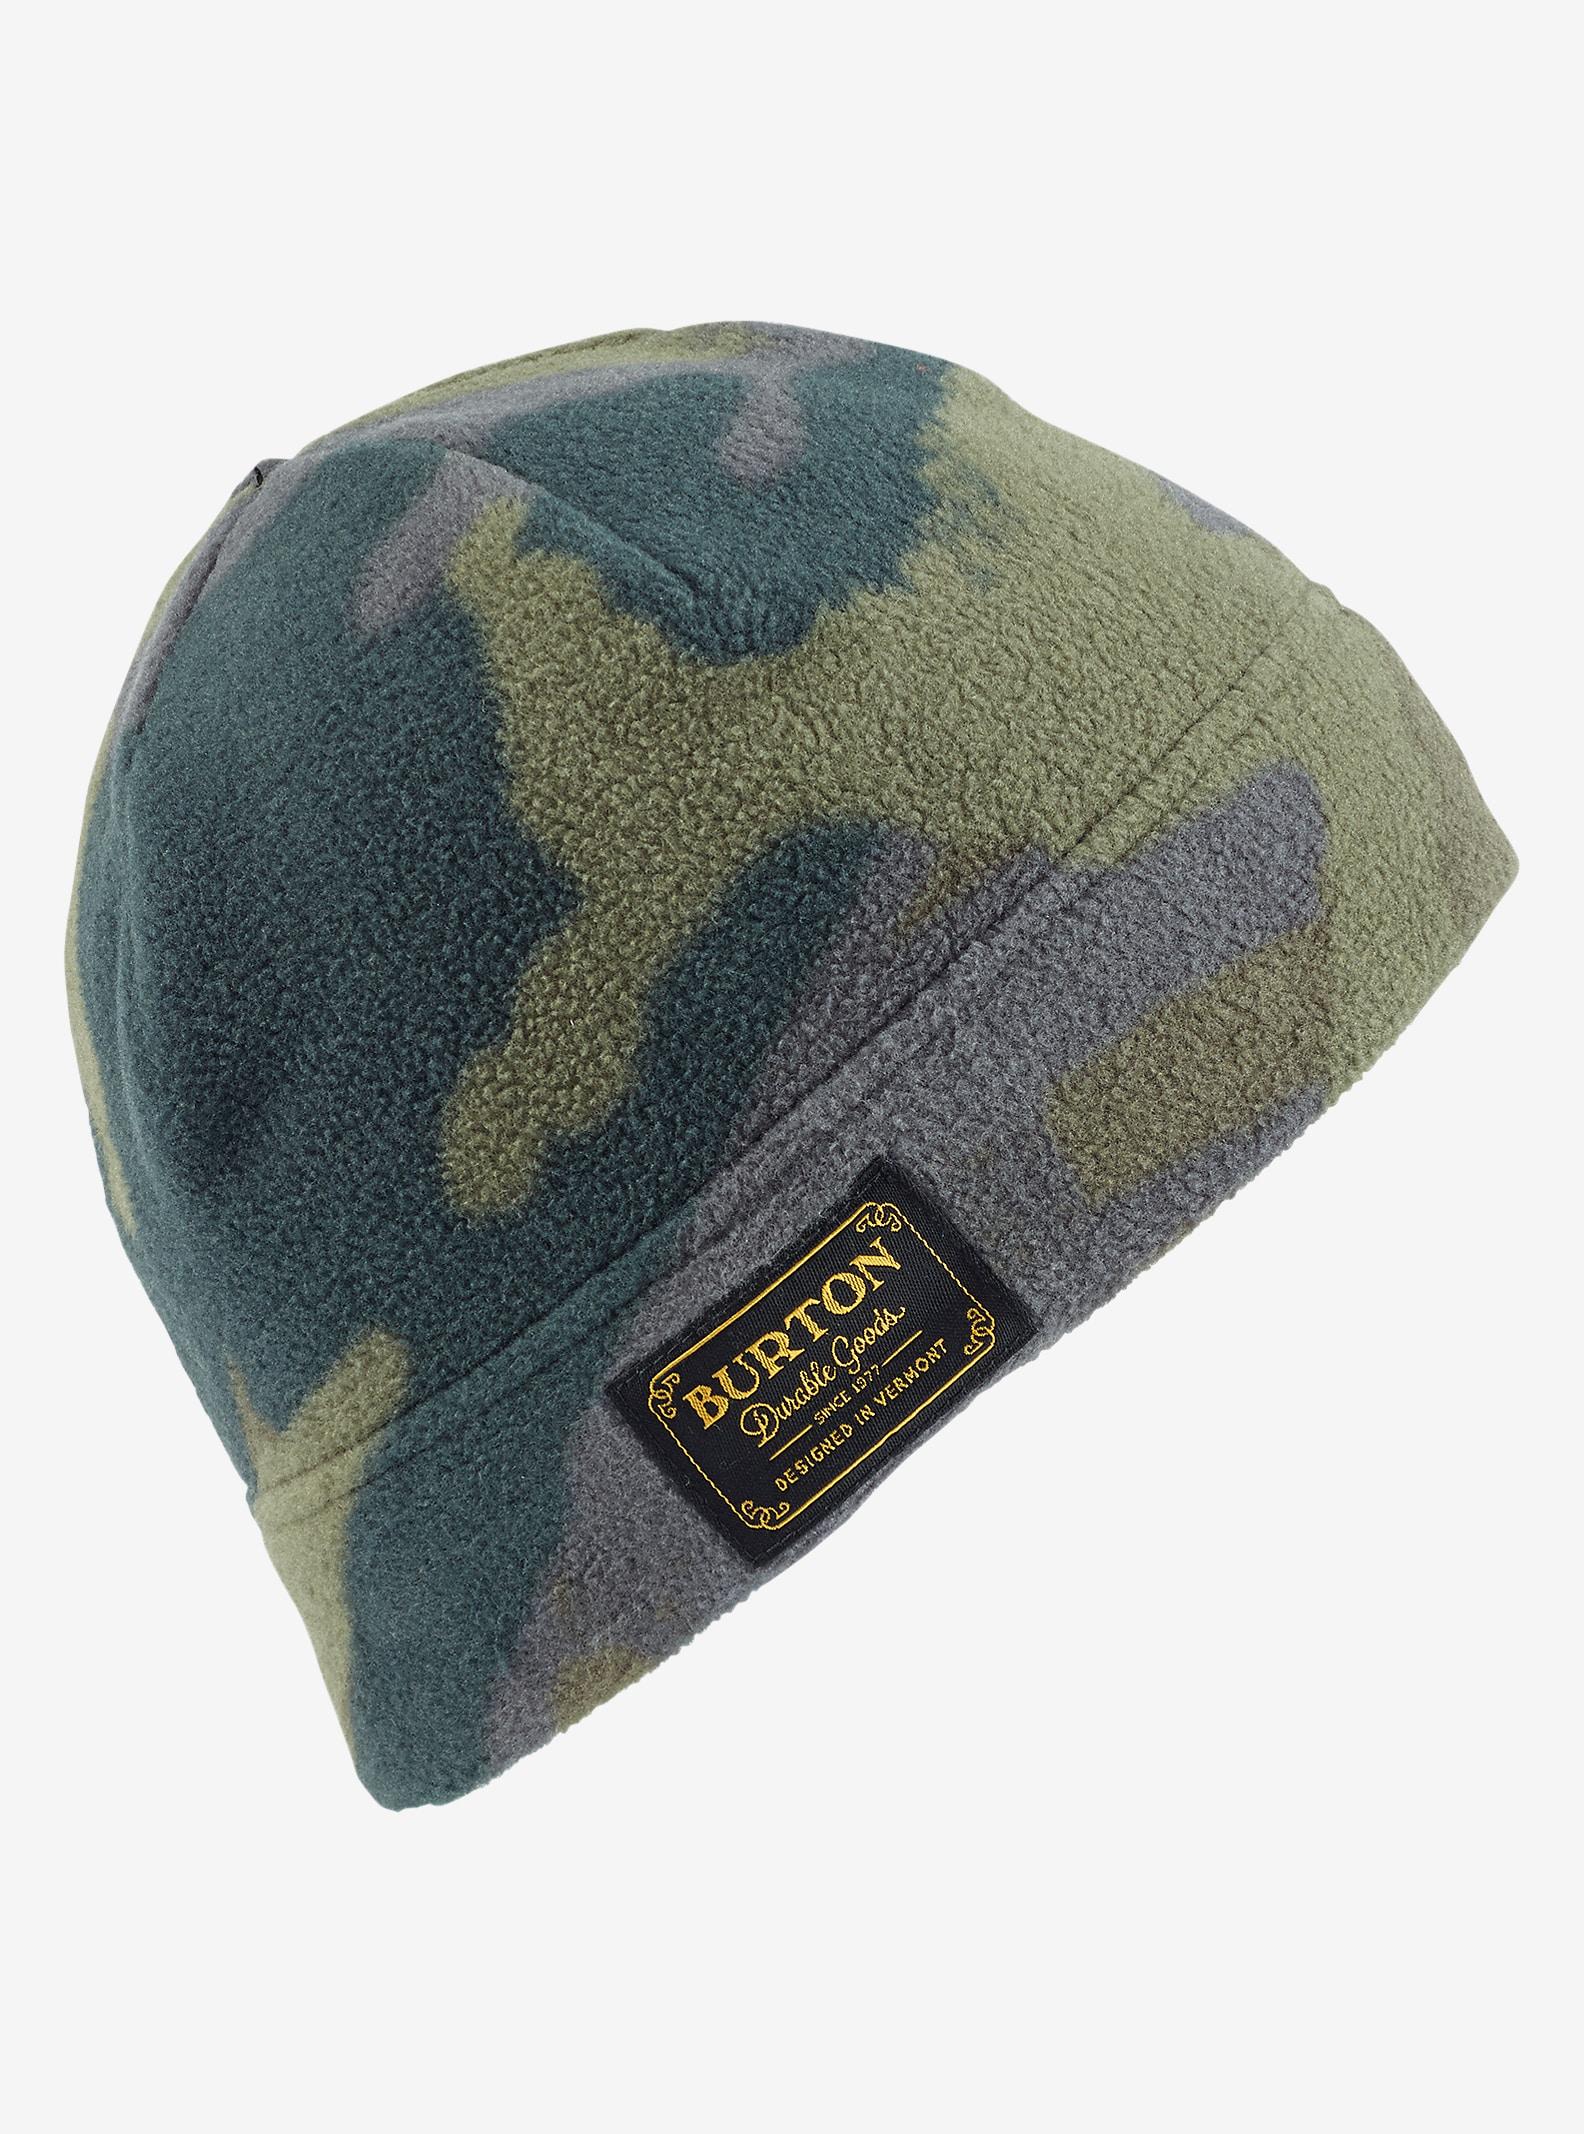 Burton Ember Fleece-Mütze angezeigt in Beetle Derby Camo